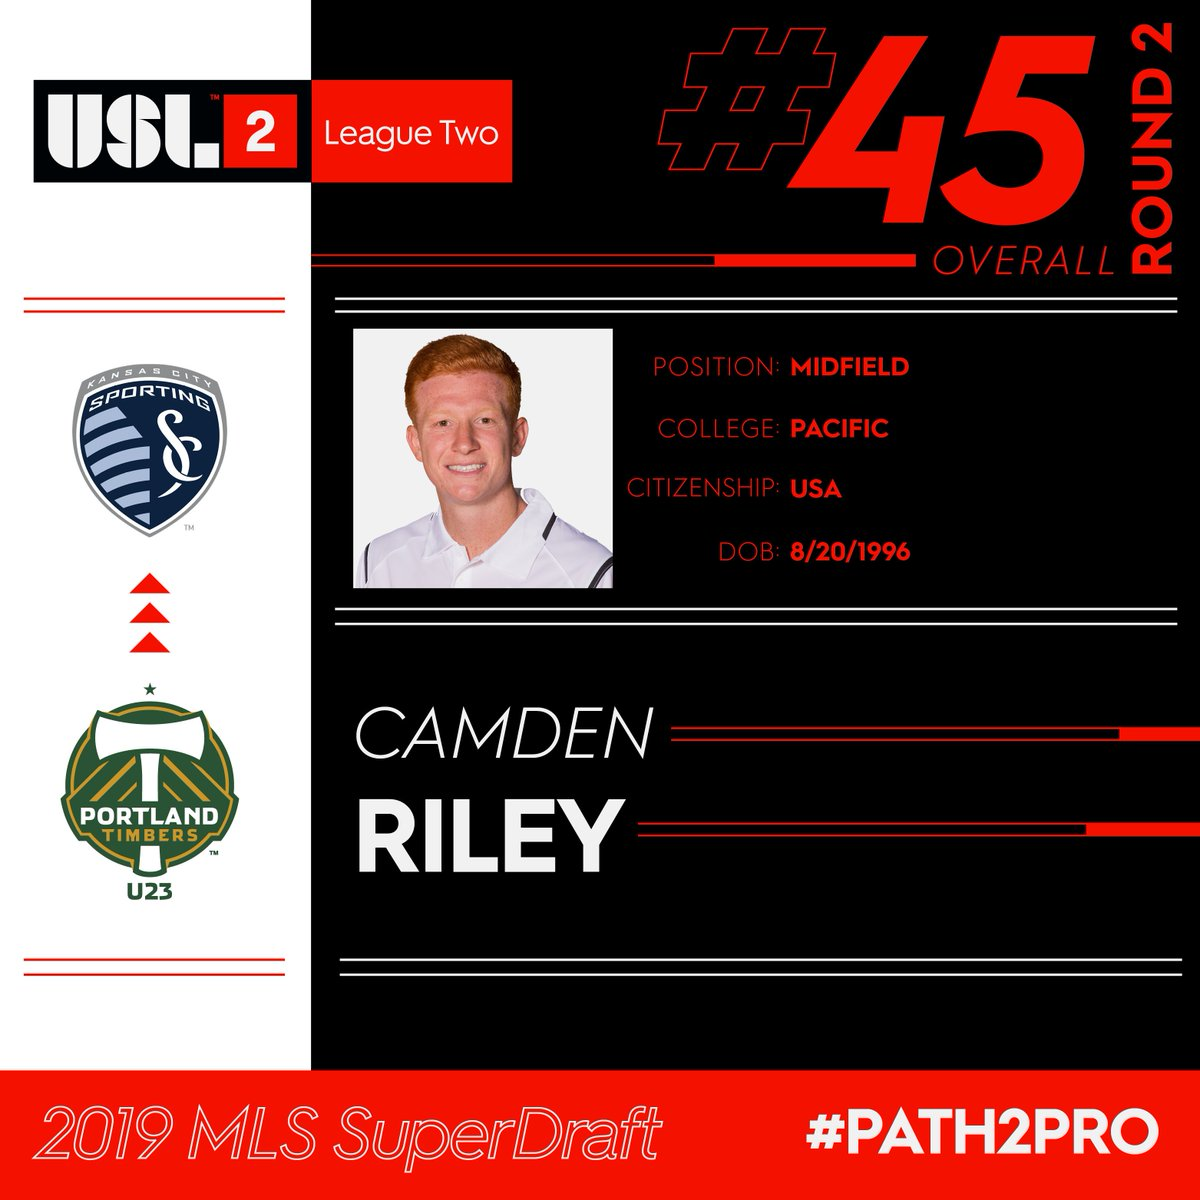 USL League Two's photo on Camden Riley